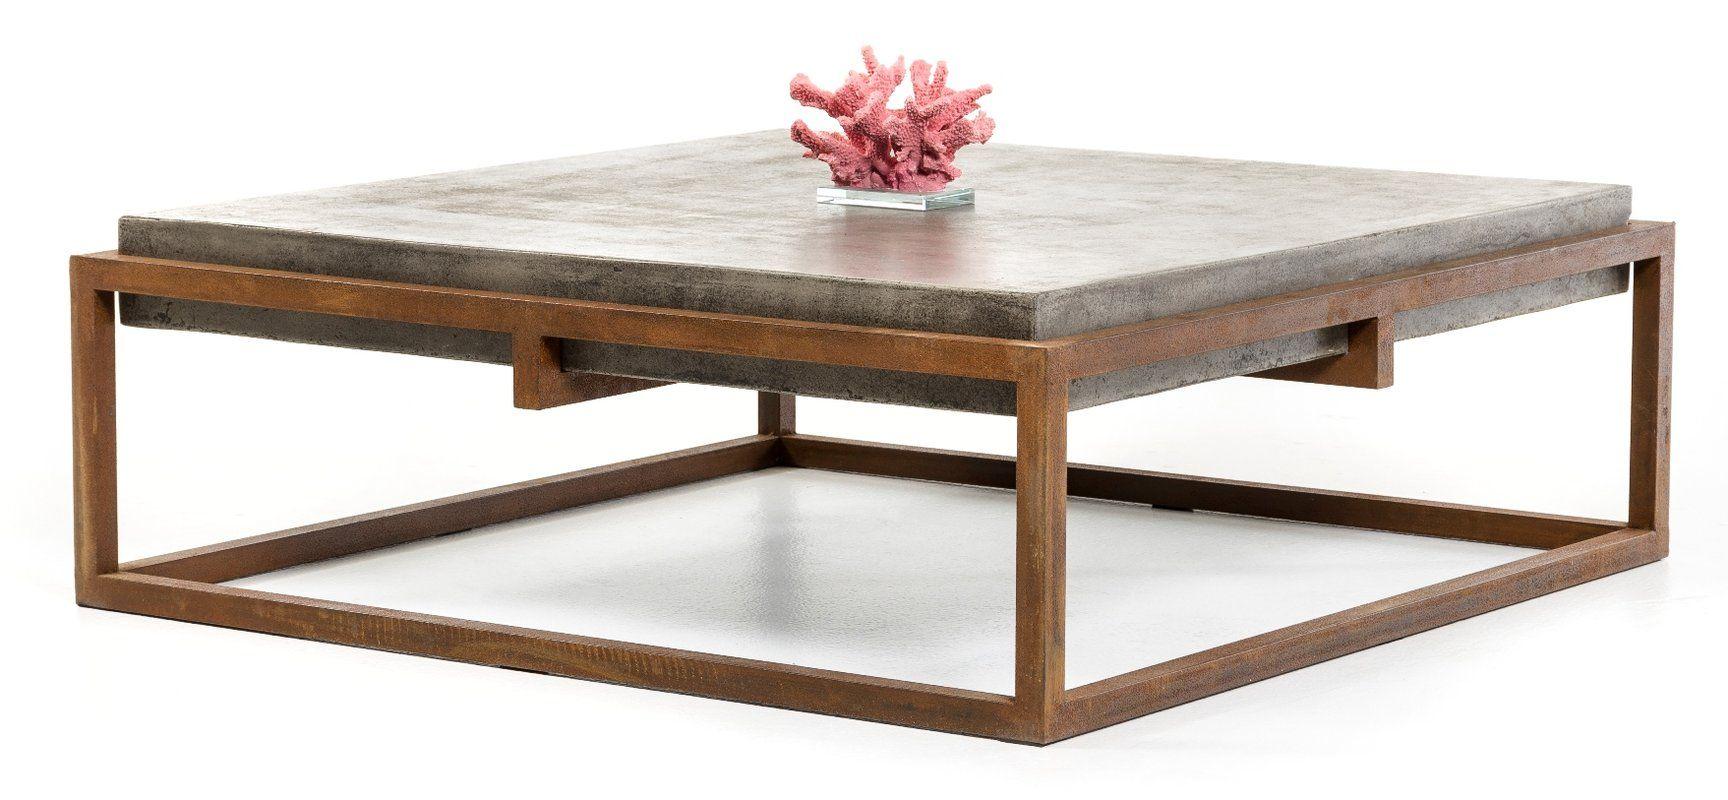 Tabetha Coffee Table Concrete Coffee Table Modern Square Coffee